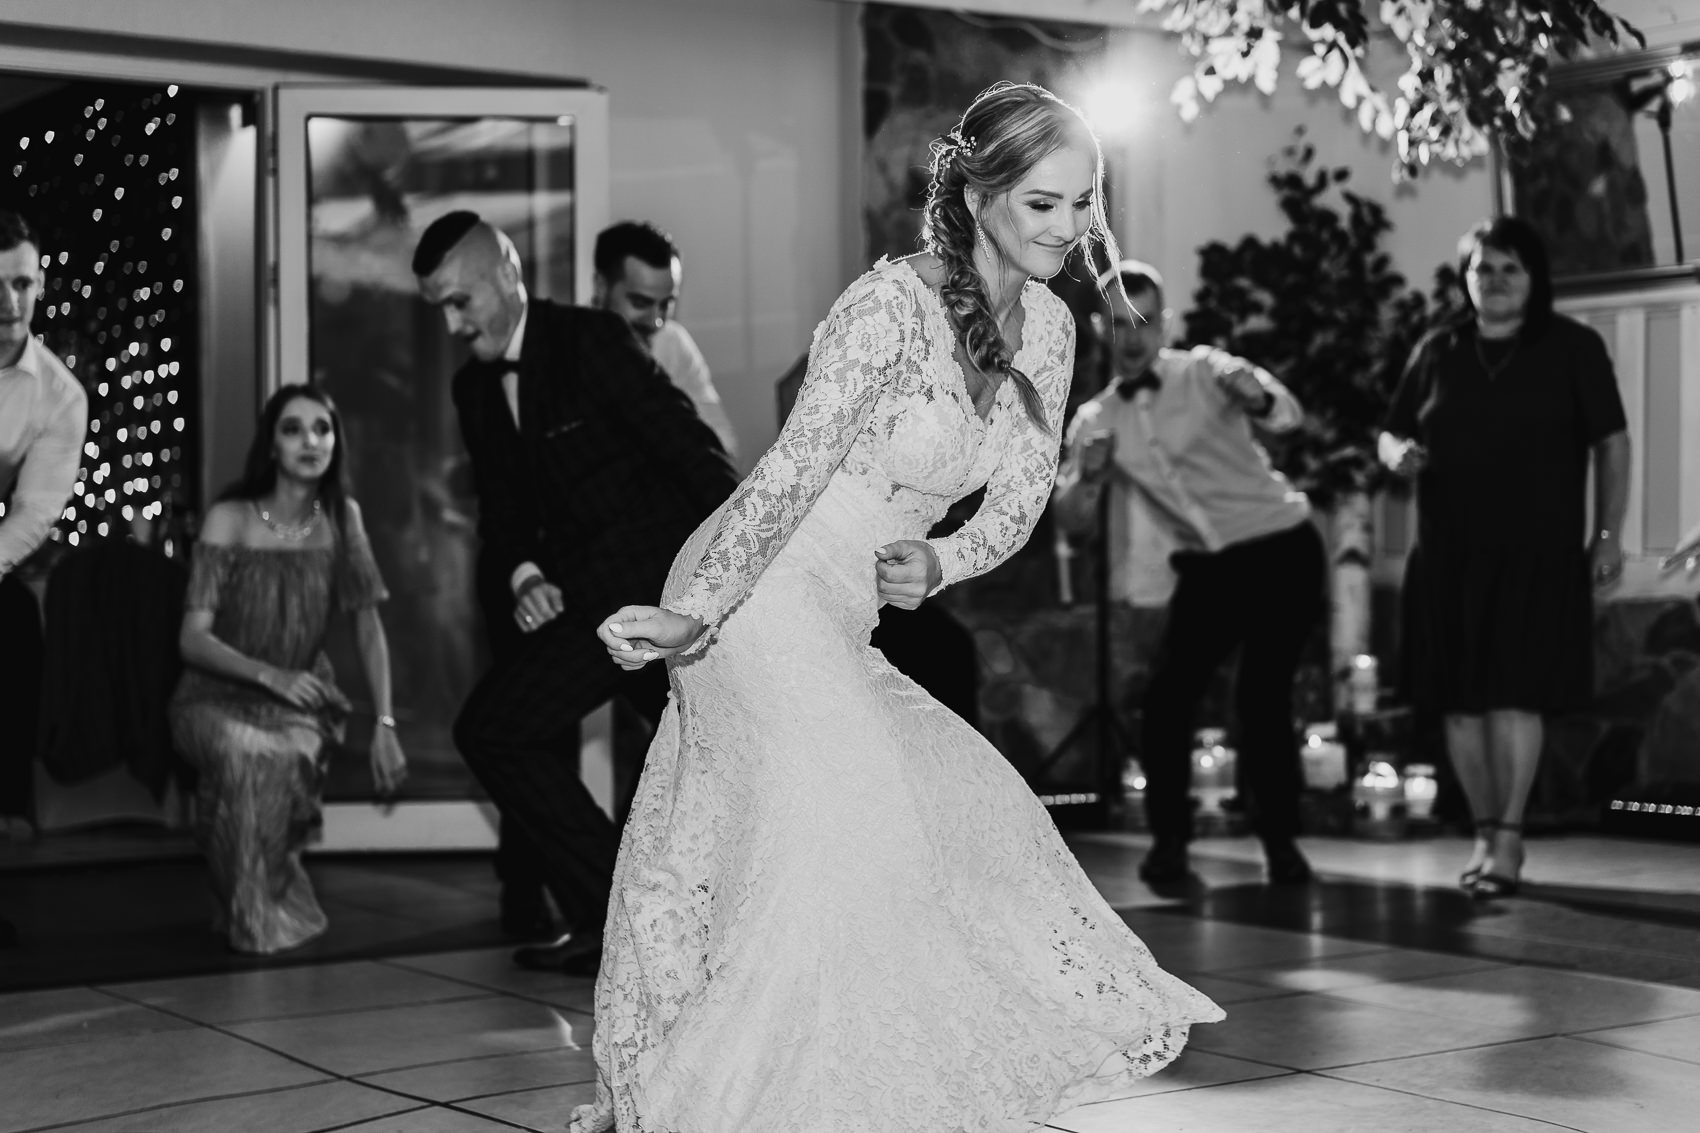 Ile kosztuje fotograf na wesele